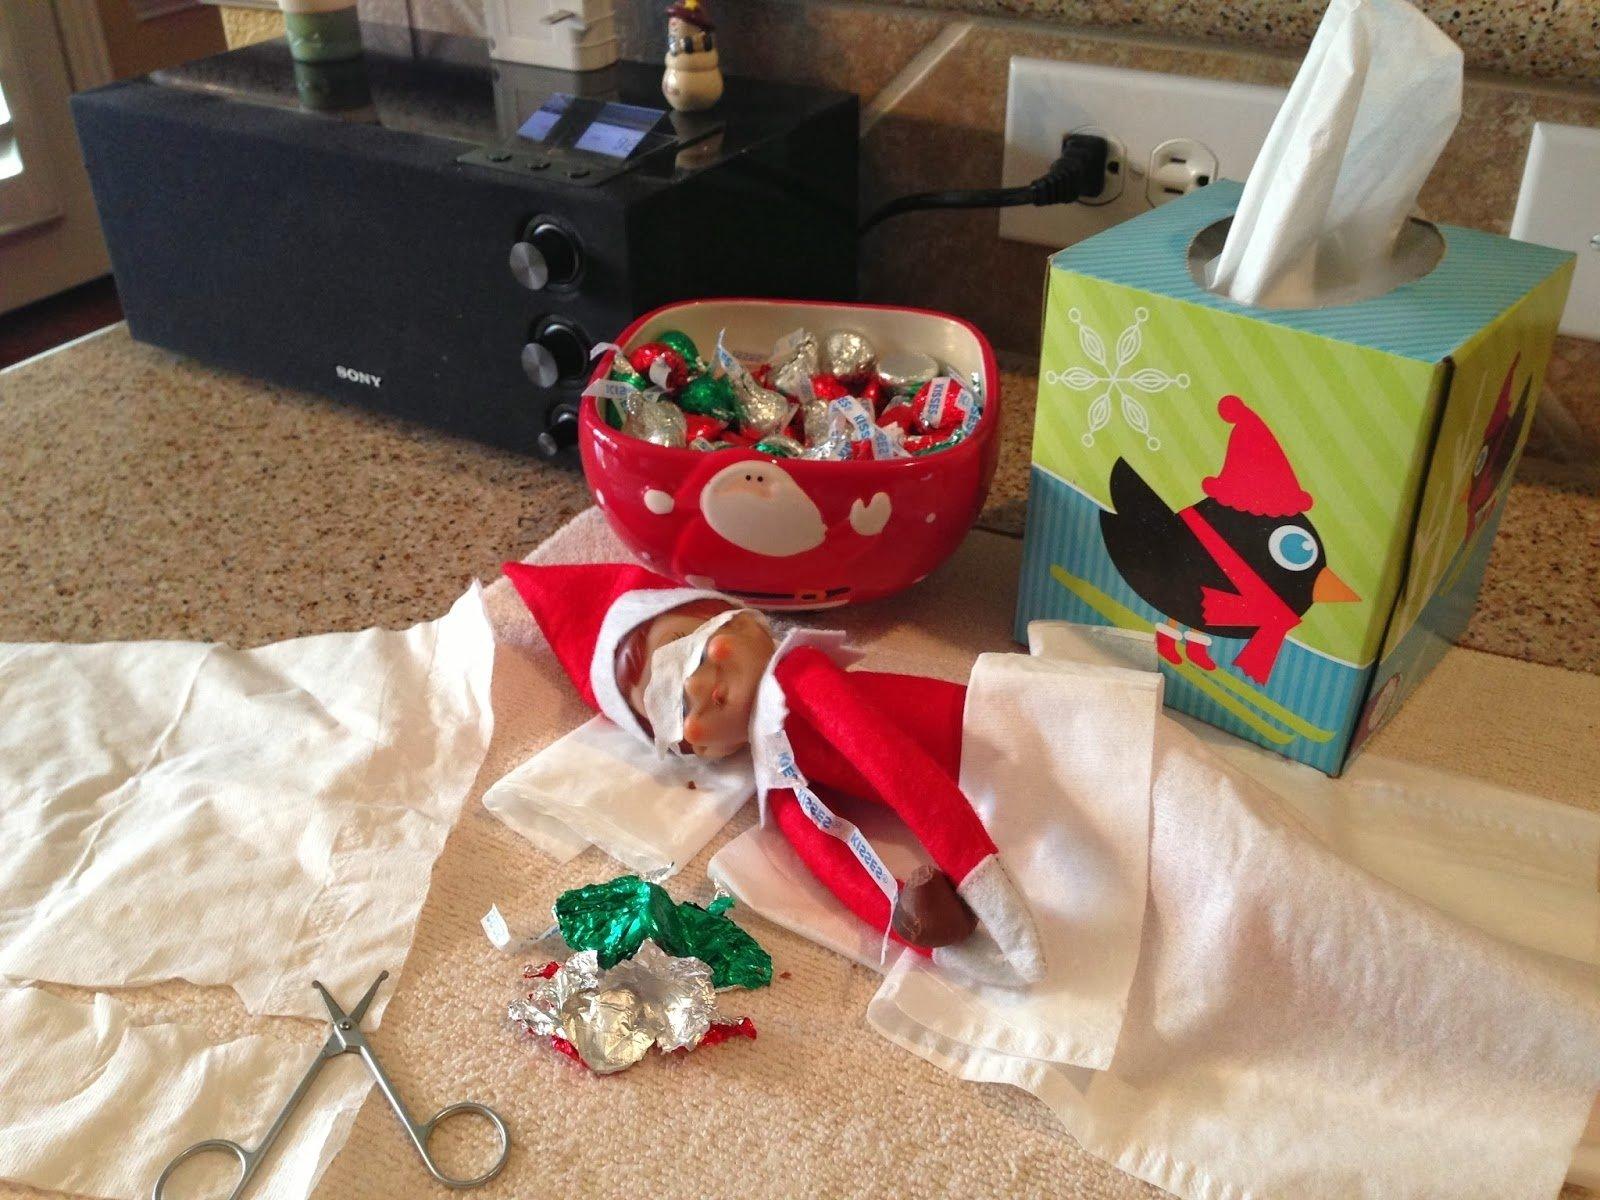 10 Lovely Elf On The Shelf Mischievous Ideas the christmas blog 2017 the very best of elf on the shelf ideas 2020